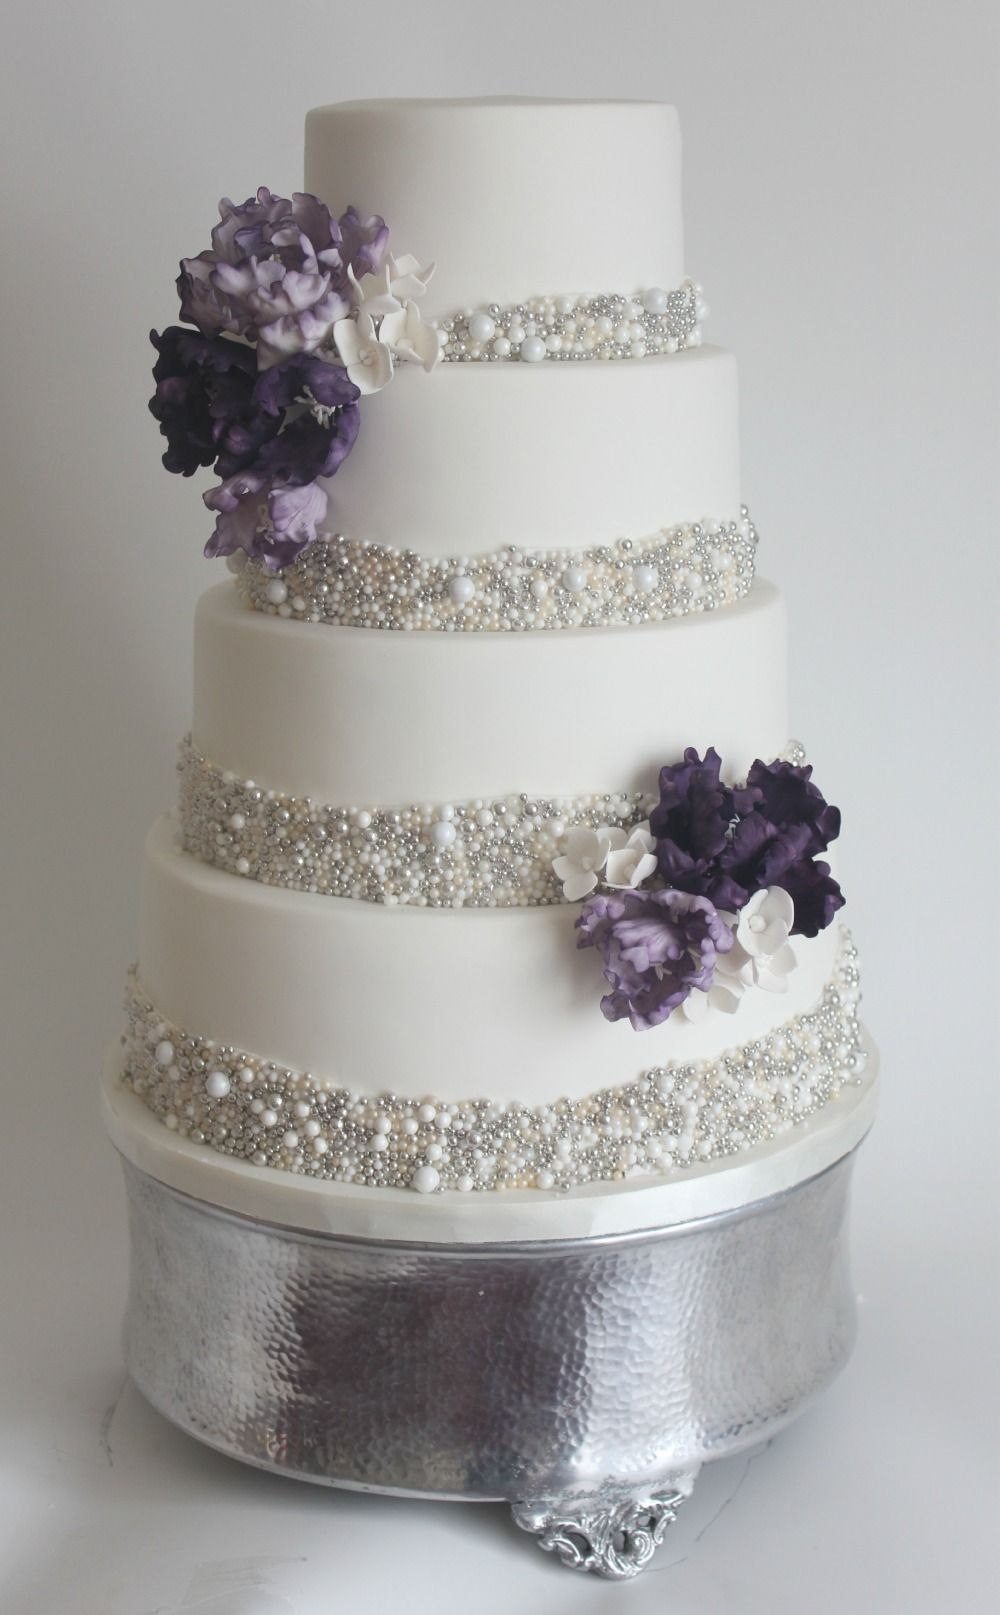 Bling Wedding Cake   she said yes!   Pinterest   Bling wedding cakes ...